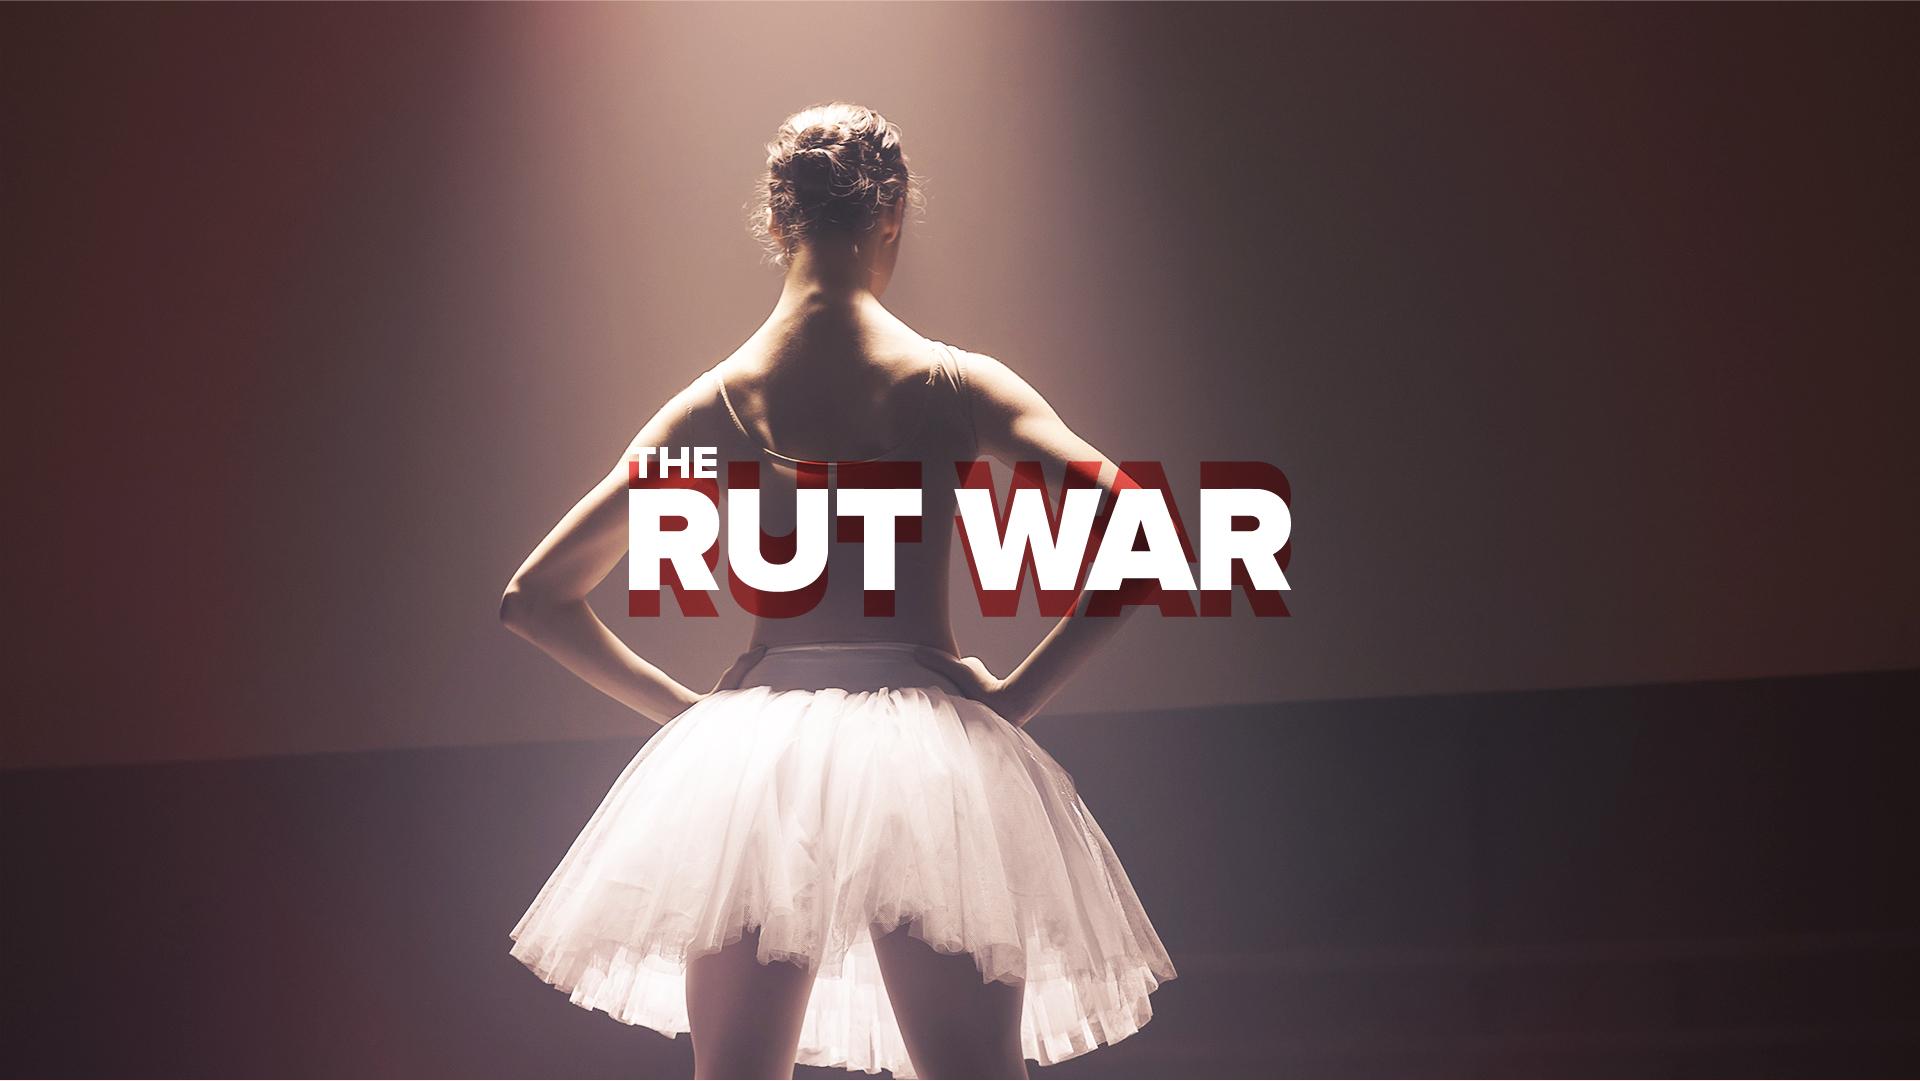 The Rut War